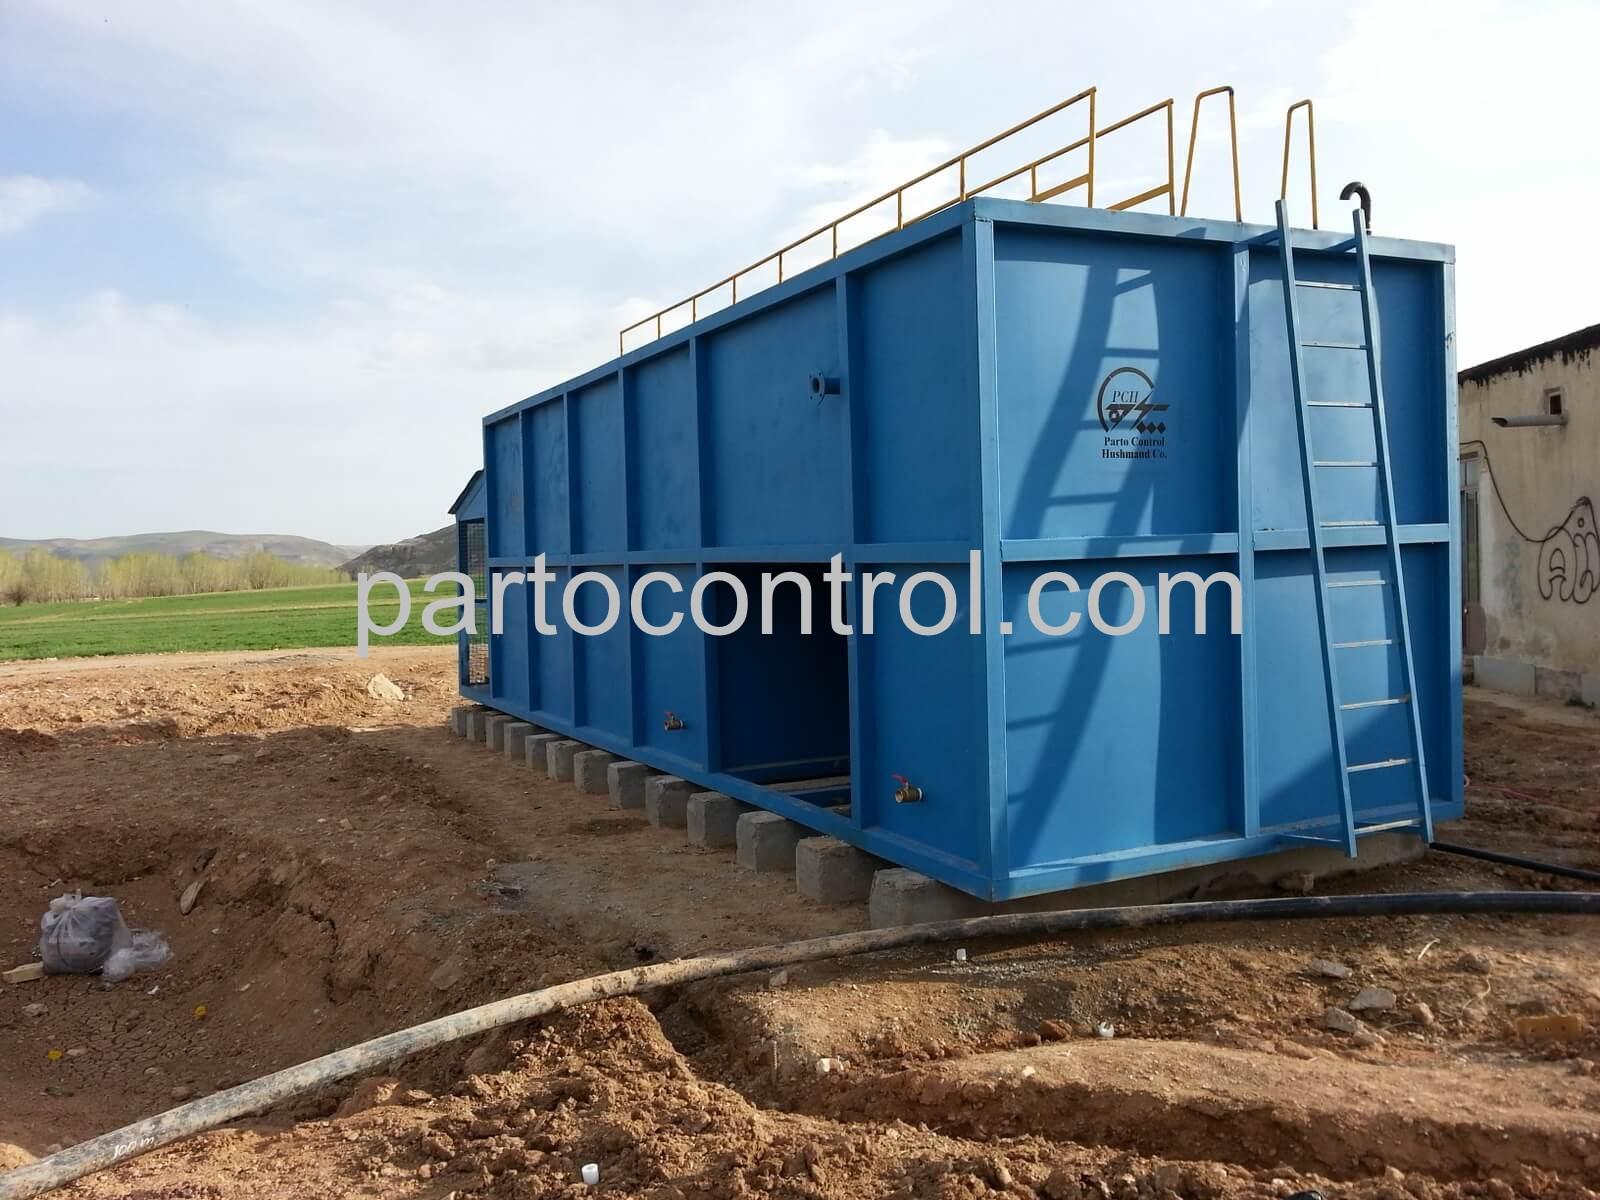 Rug Sewage Treatment Packageتصفیه فاضلاب کارگاه قالیشویی خمسه 1 - پروژه تصفیه فاضلاب کارگاه های قالیشویی